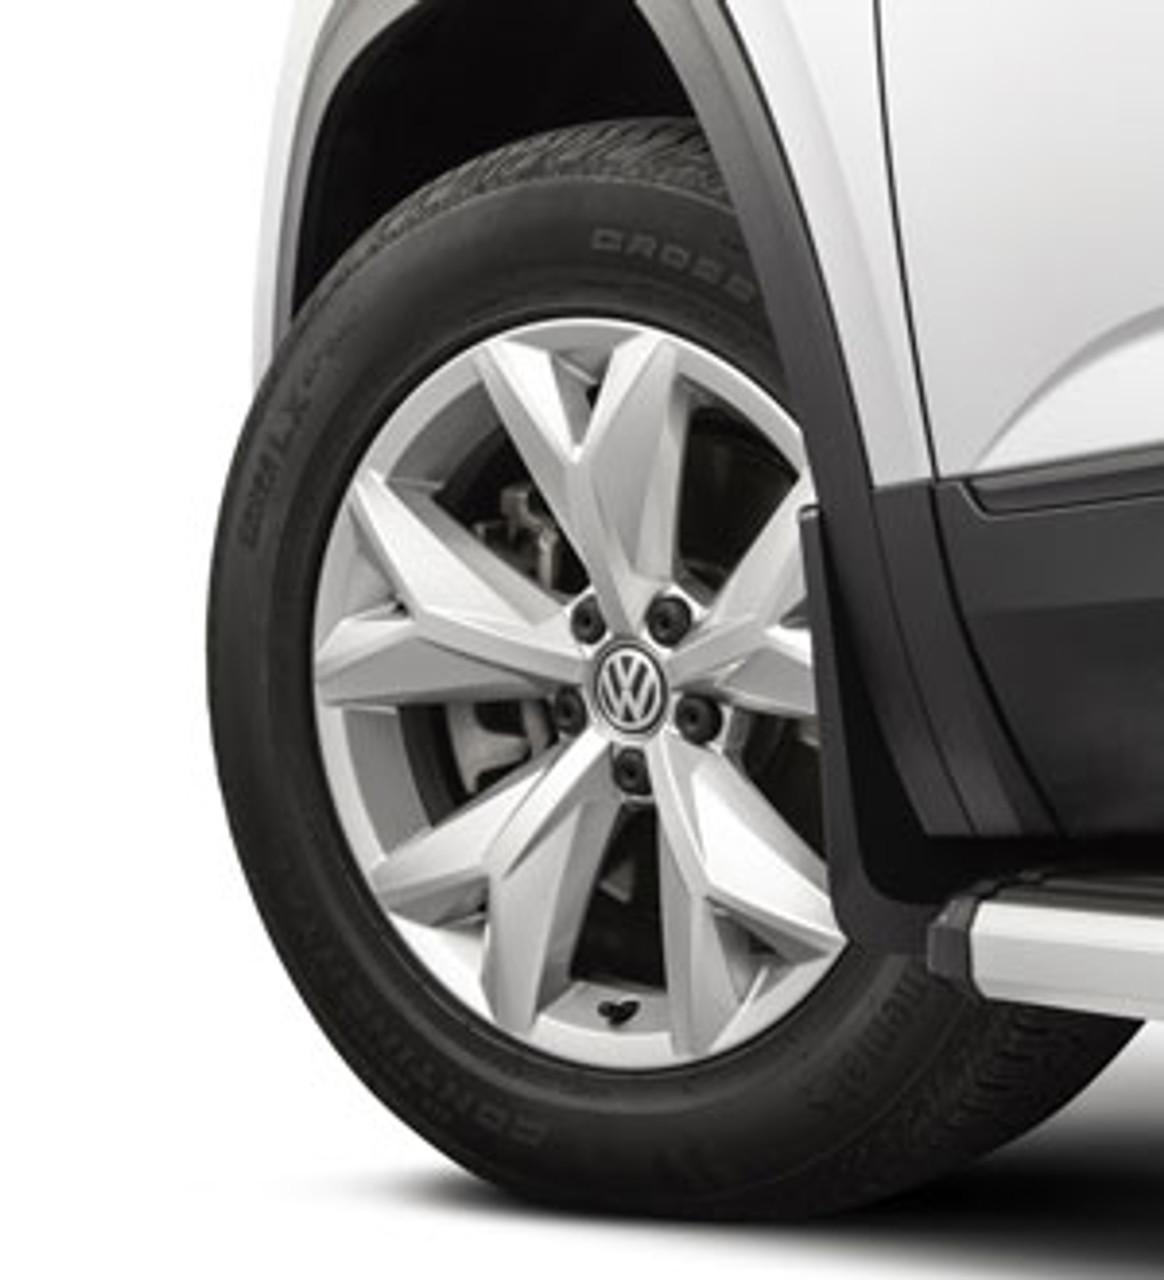 VW Atlas Mud Guards